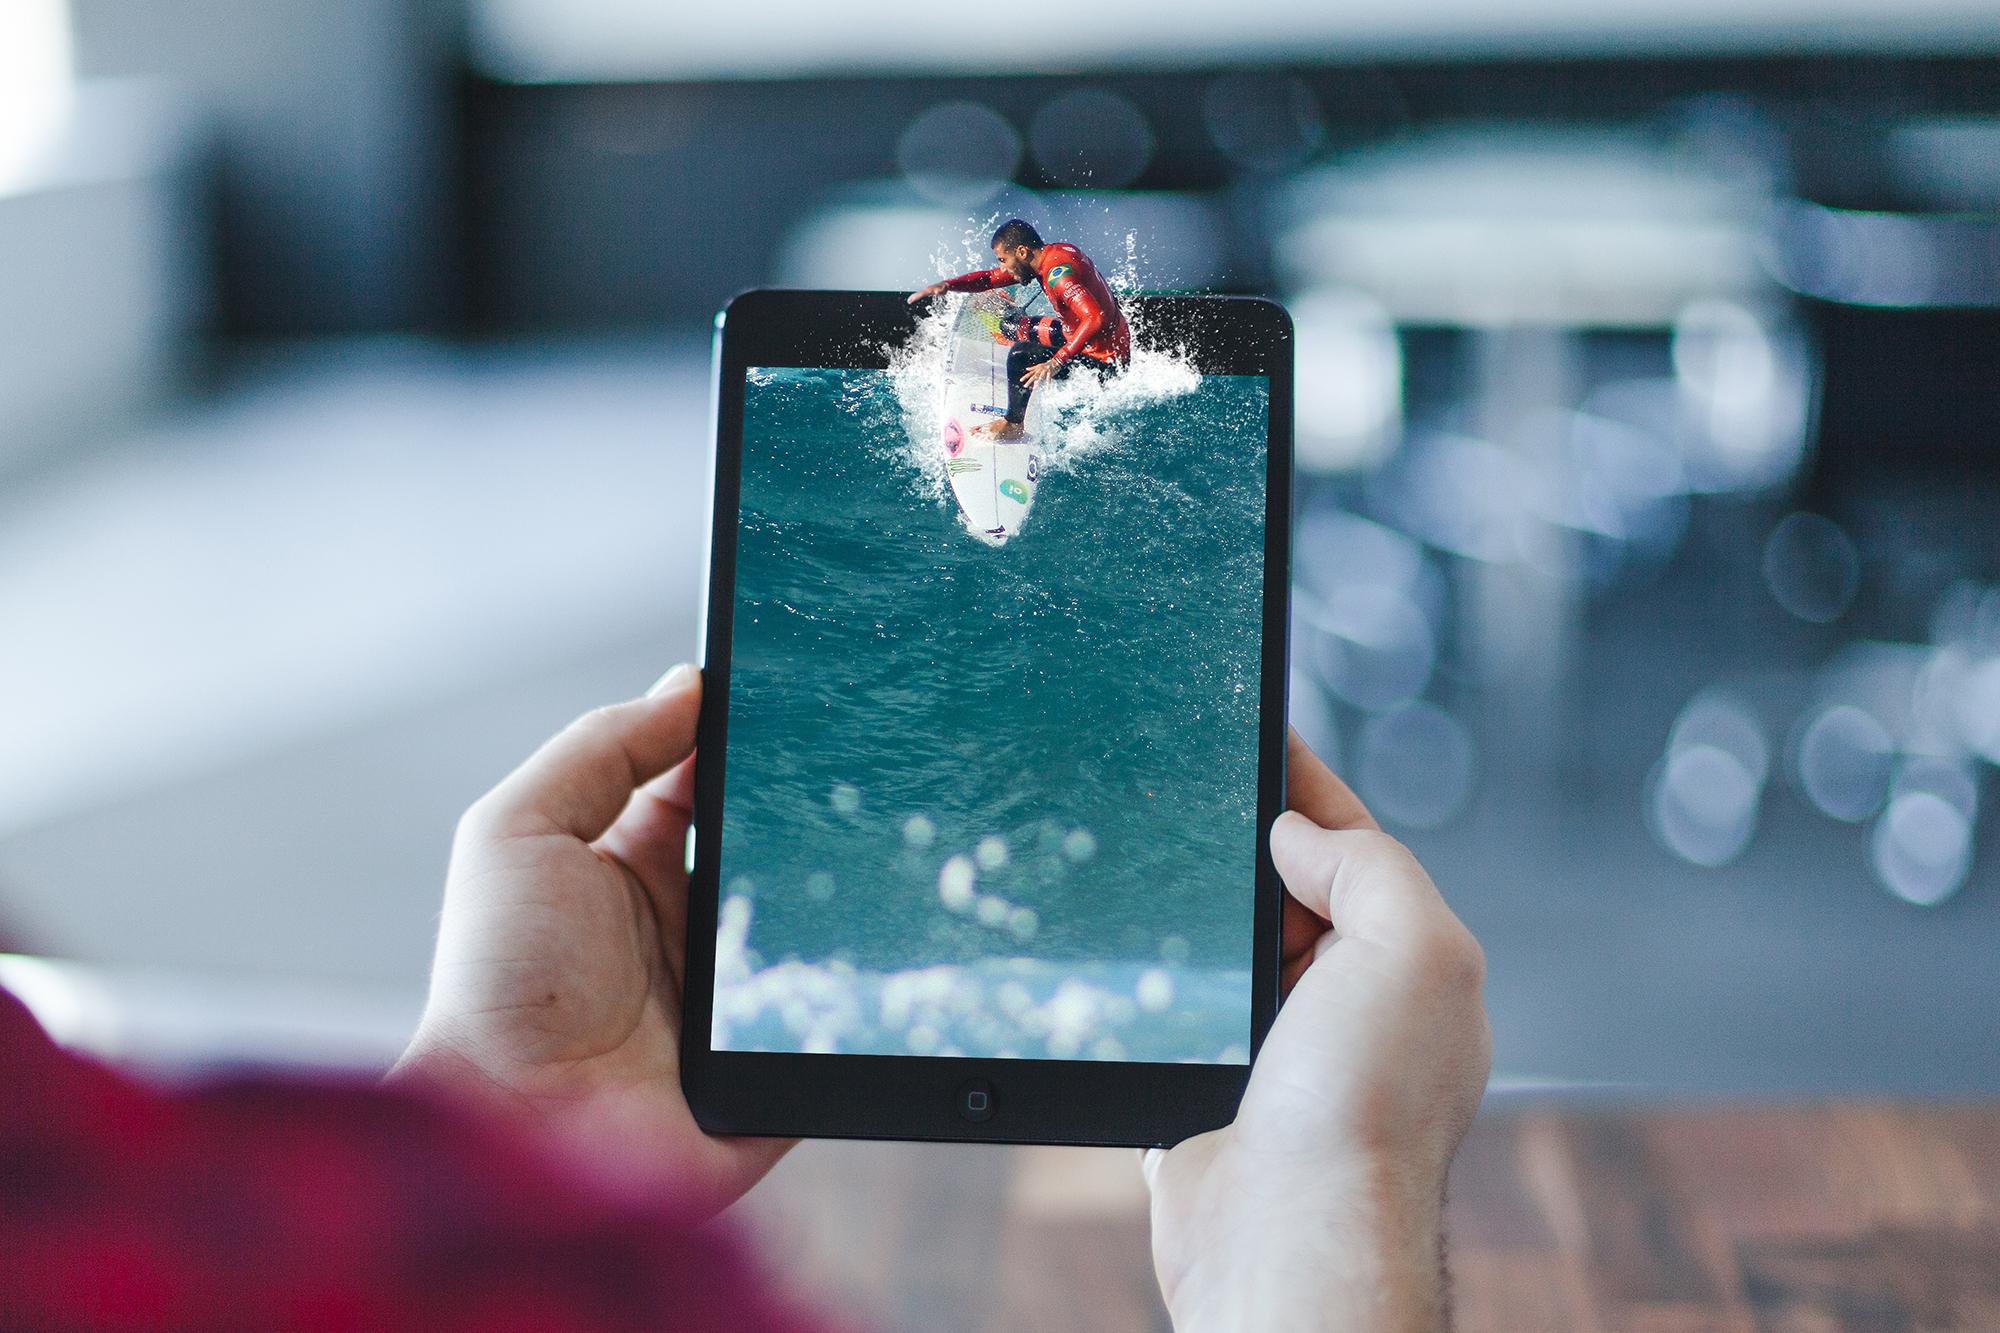 iPAD SURFER   COMPOSITE